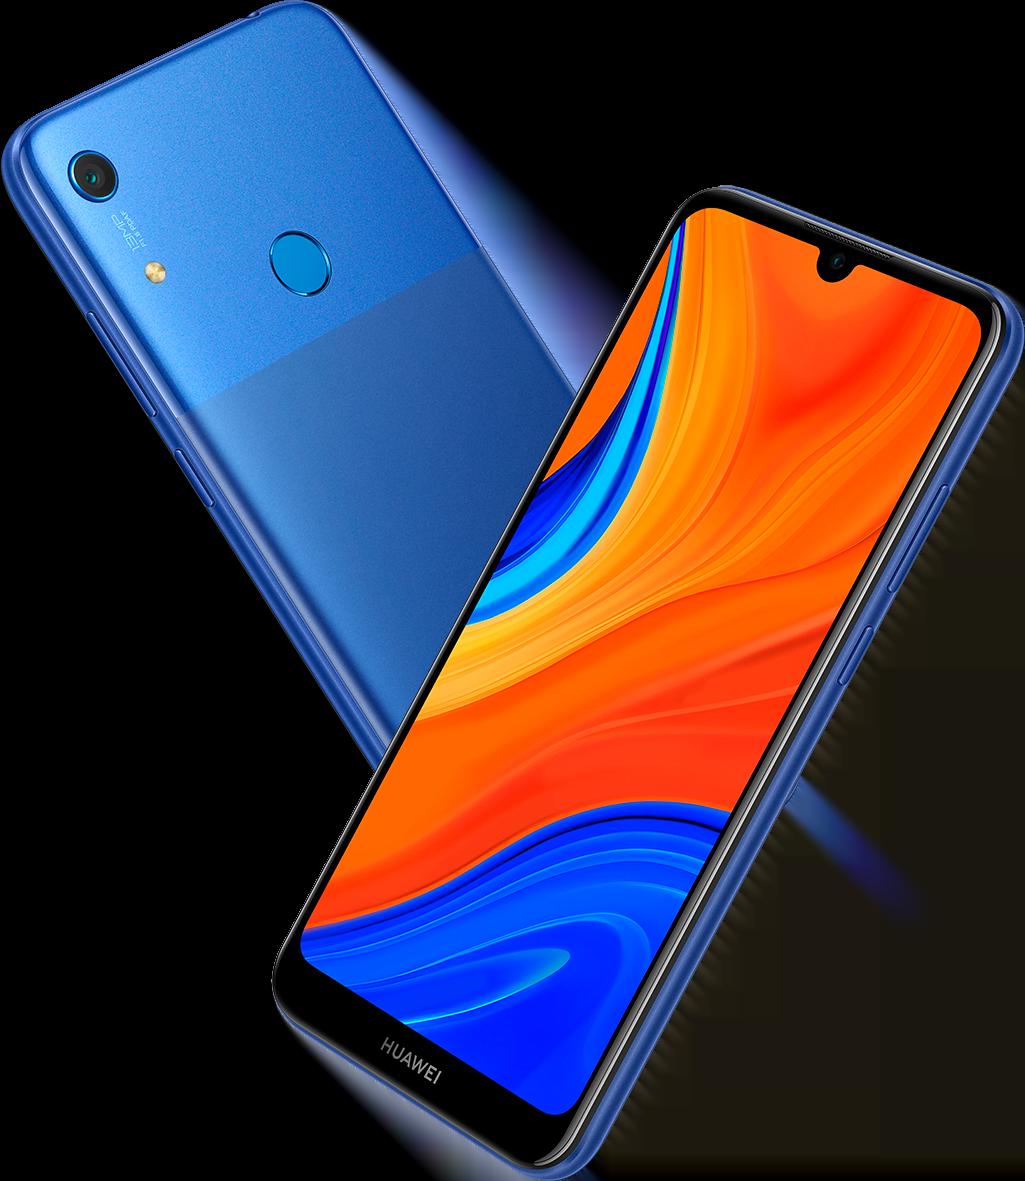 Huawei presenta il nuovo smartphone Y6s 2